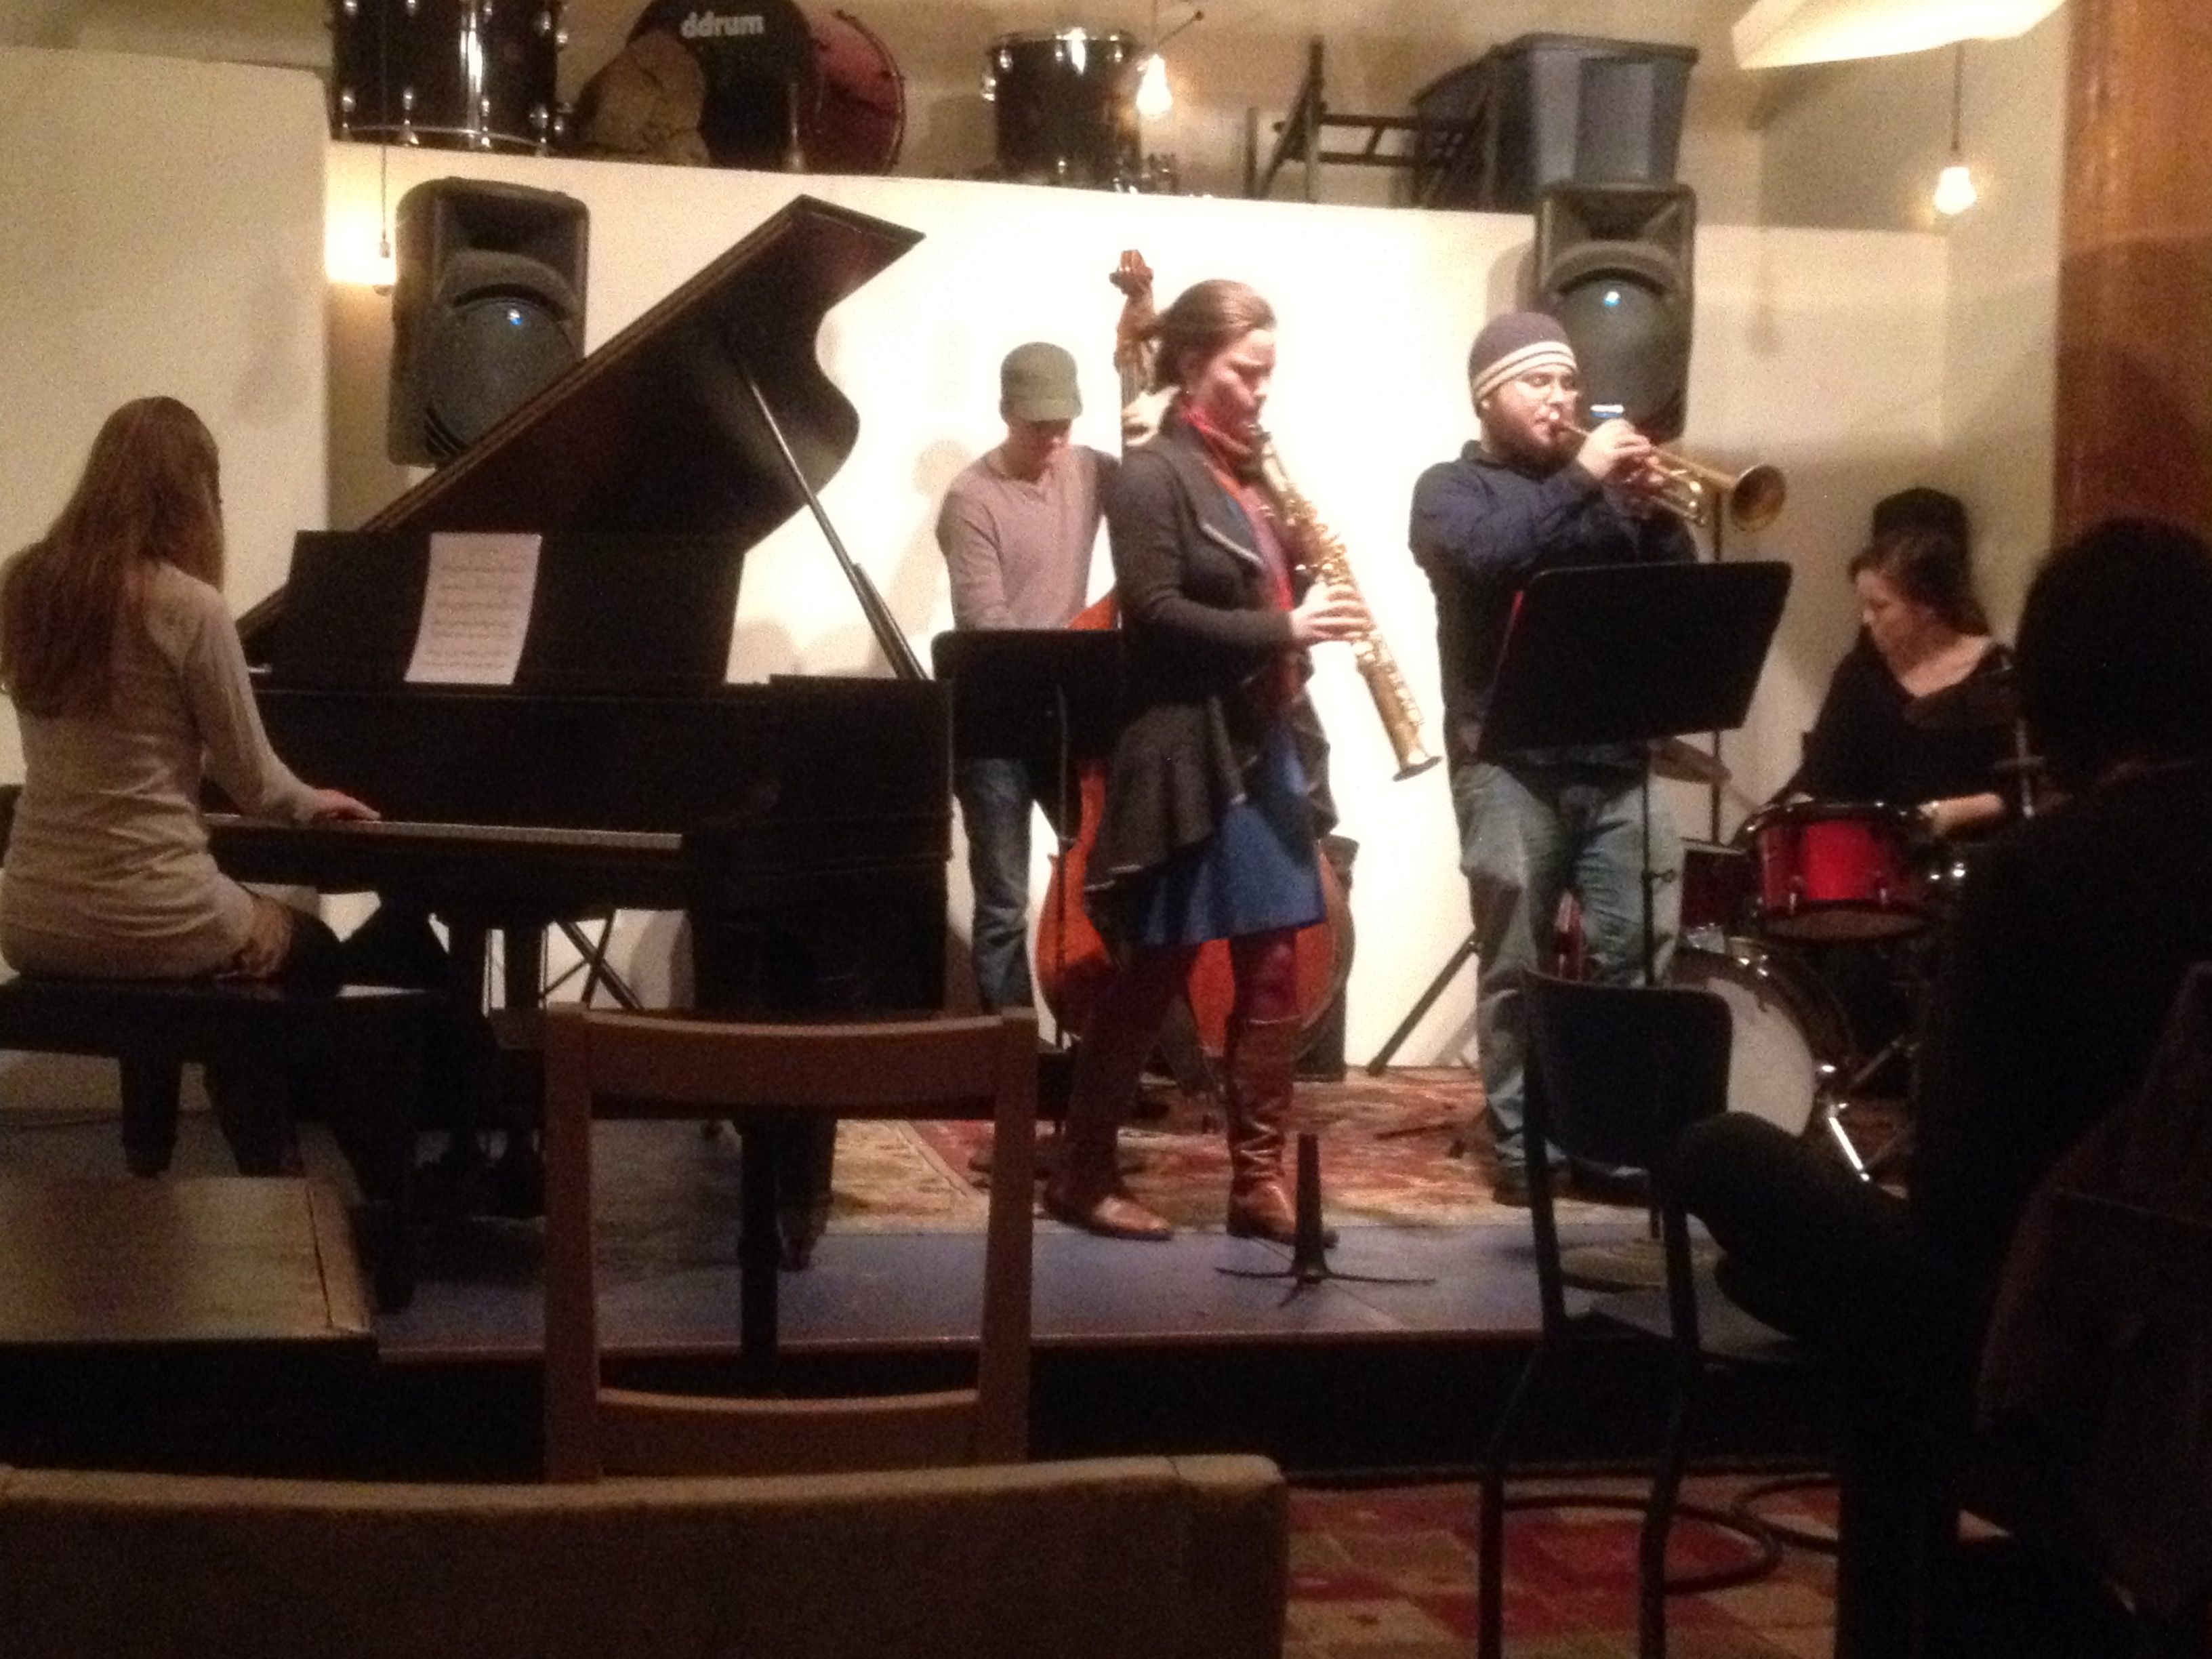 Douglass St Music Collective 3/3/12